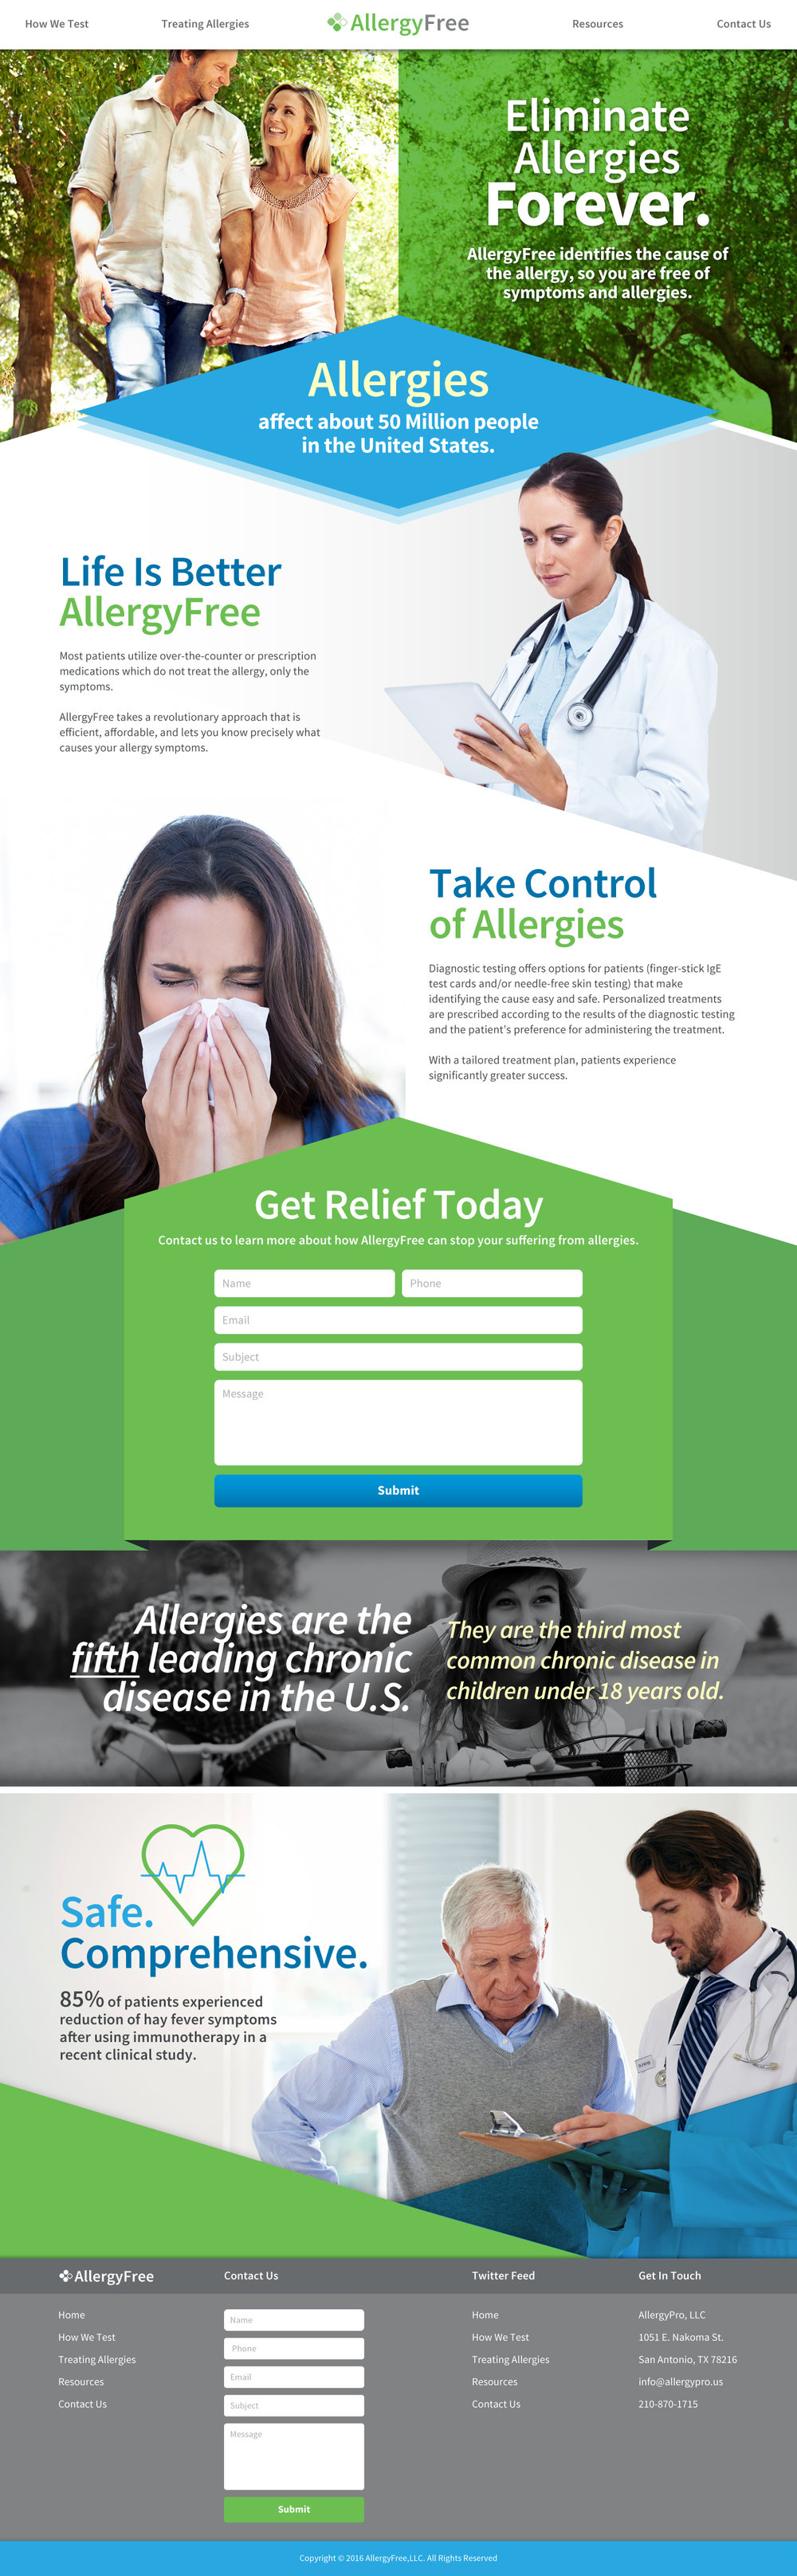 allergyfree-home-page-ui.jpg